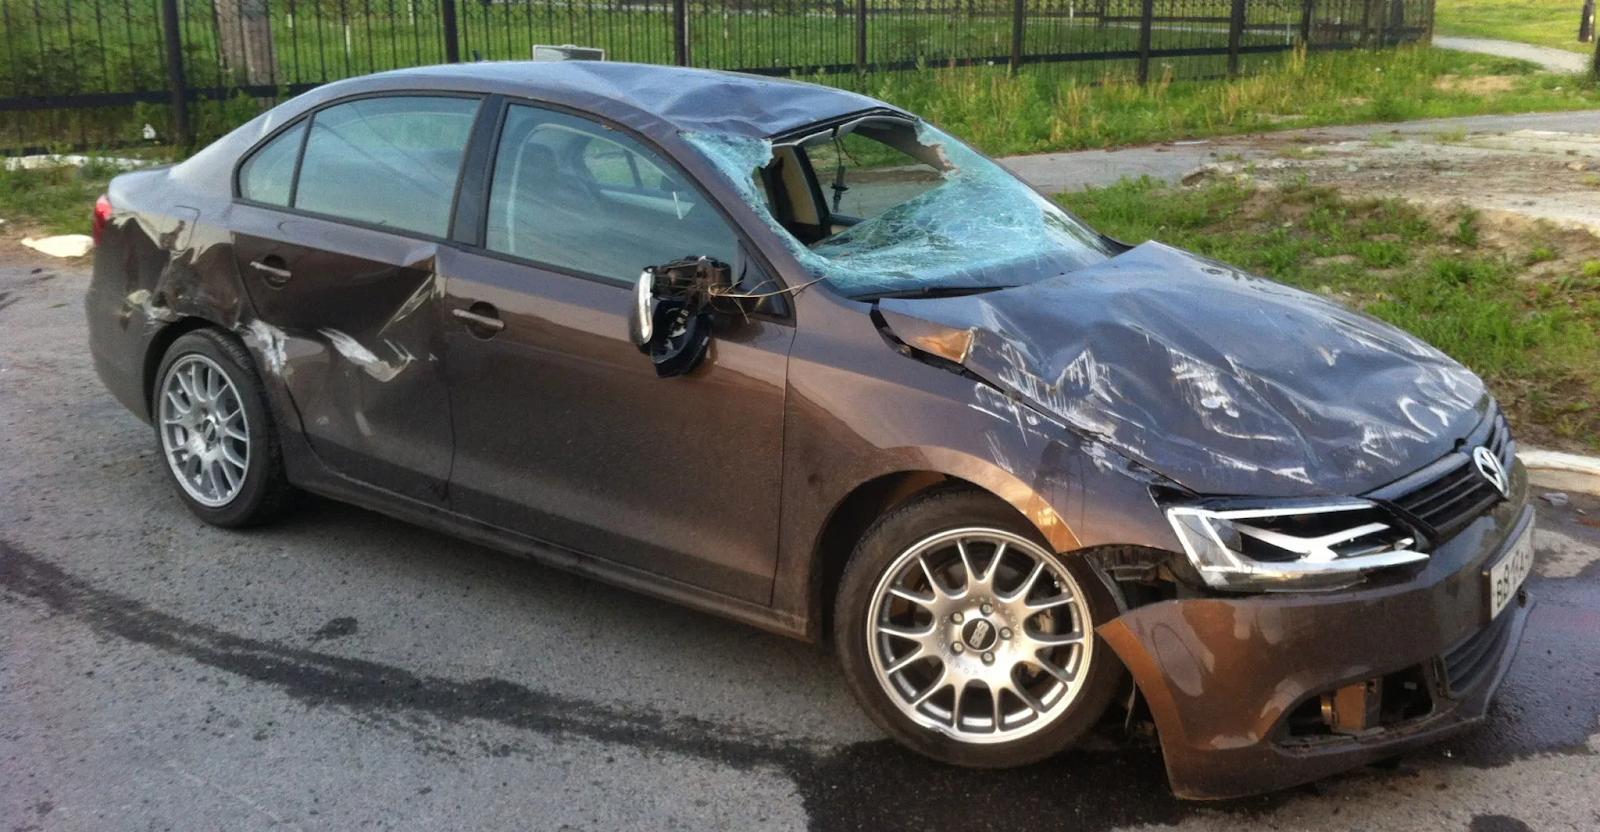 Оценка автомобиля с пробегом